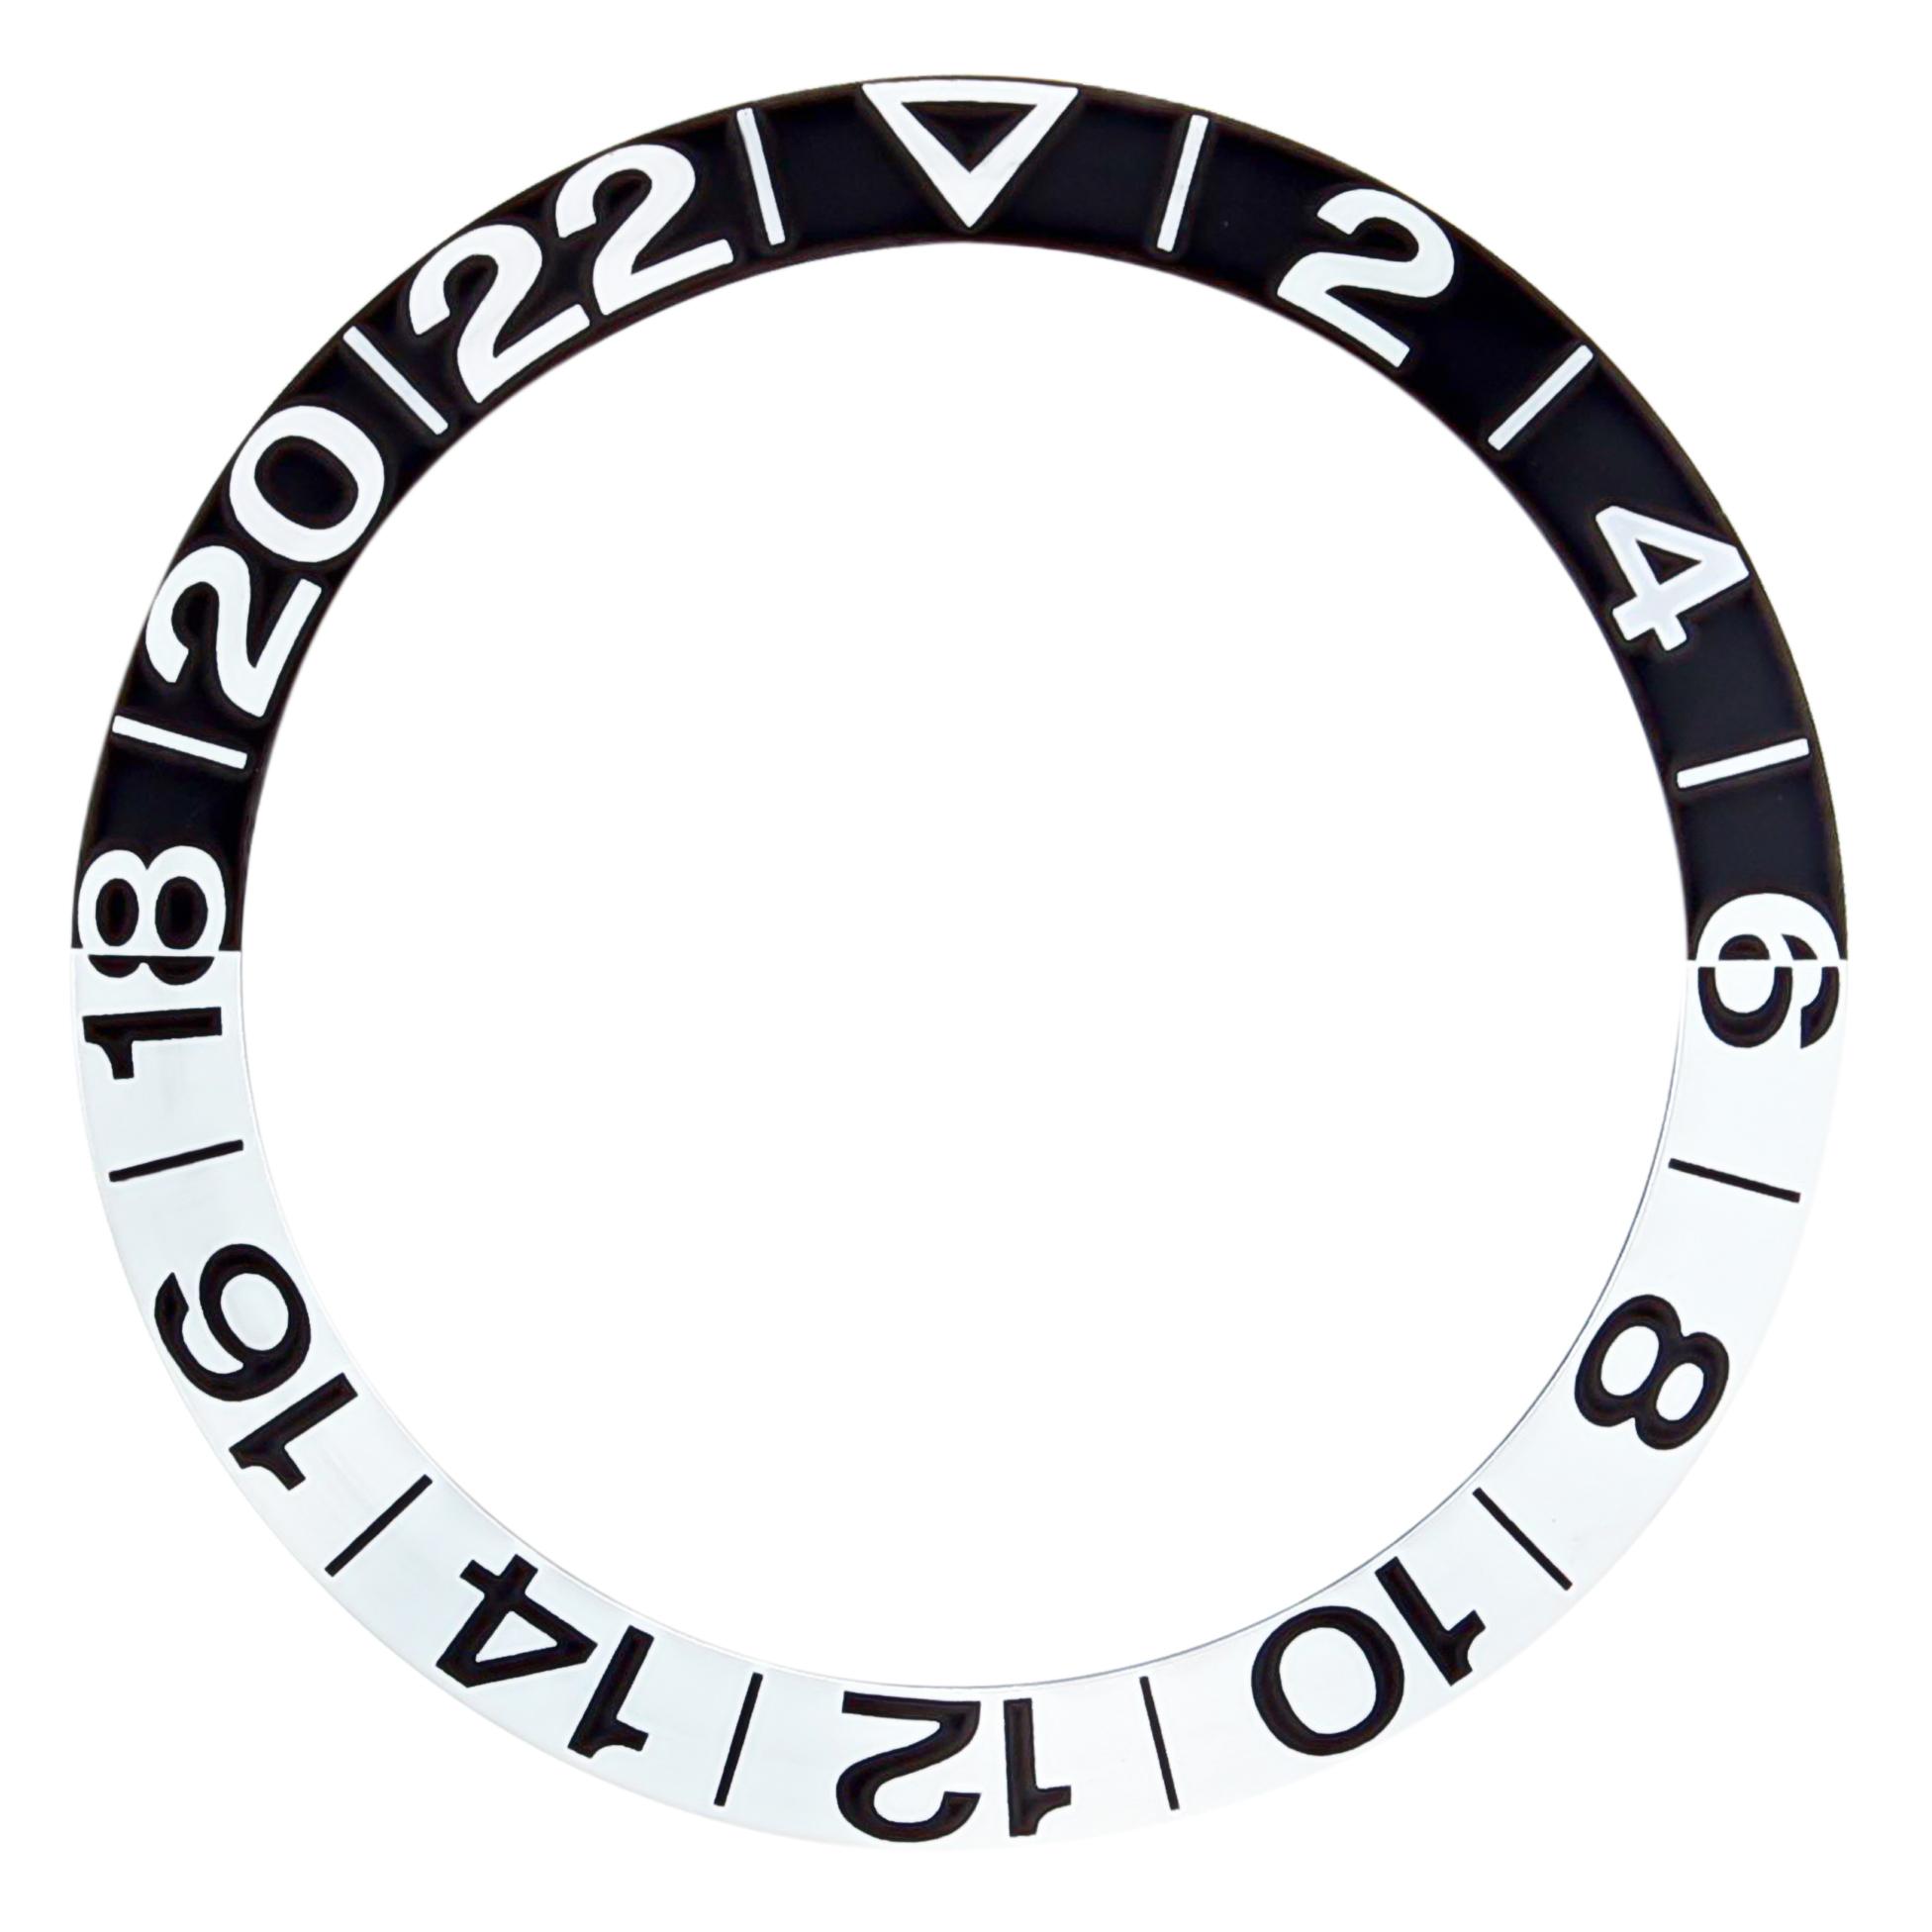 BEZEL INSERT FOR OMEGA GMT 300M SEAMASTER 50th ANNIVERSARY 2354.50 BLACK/SILVER